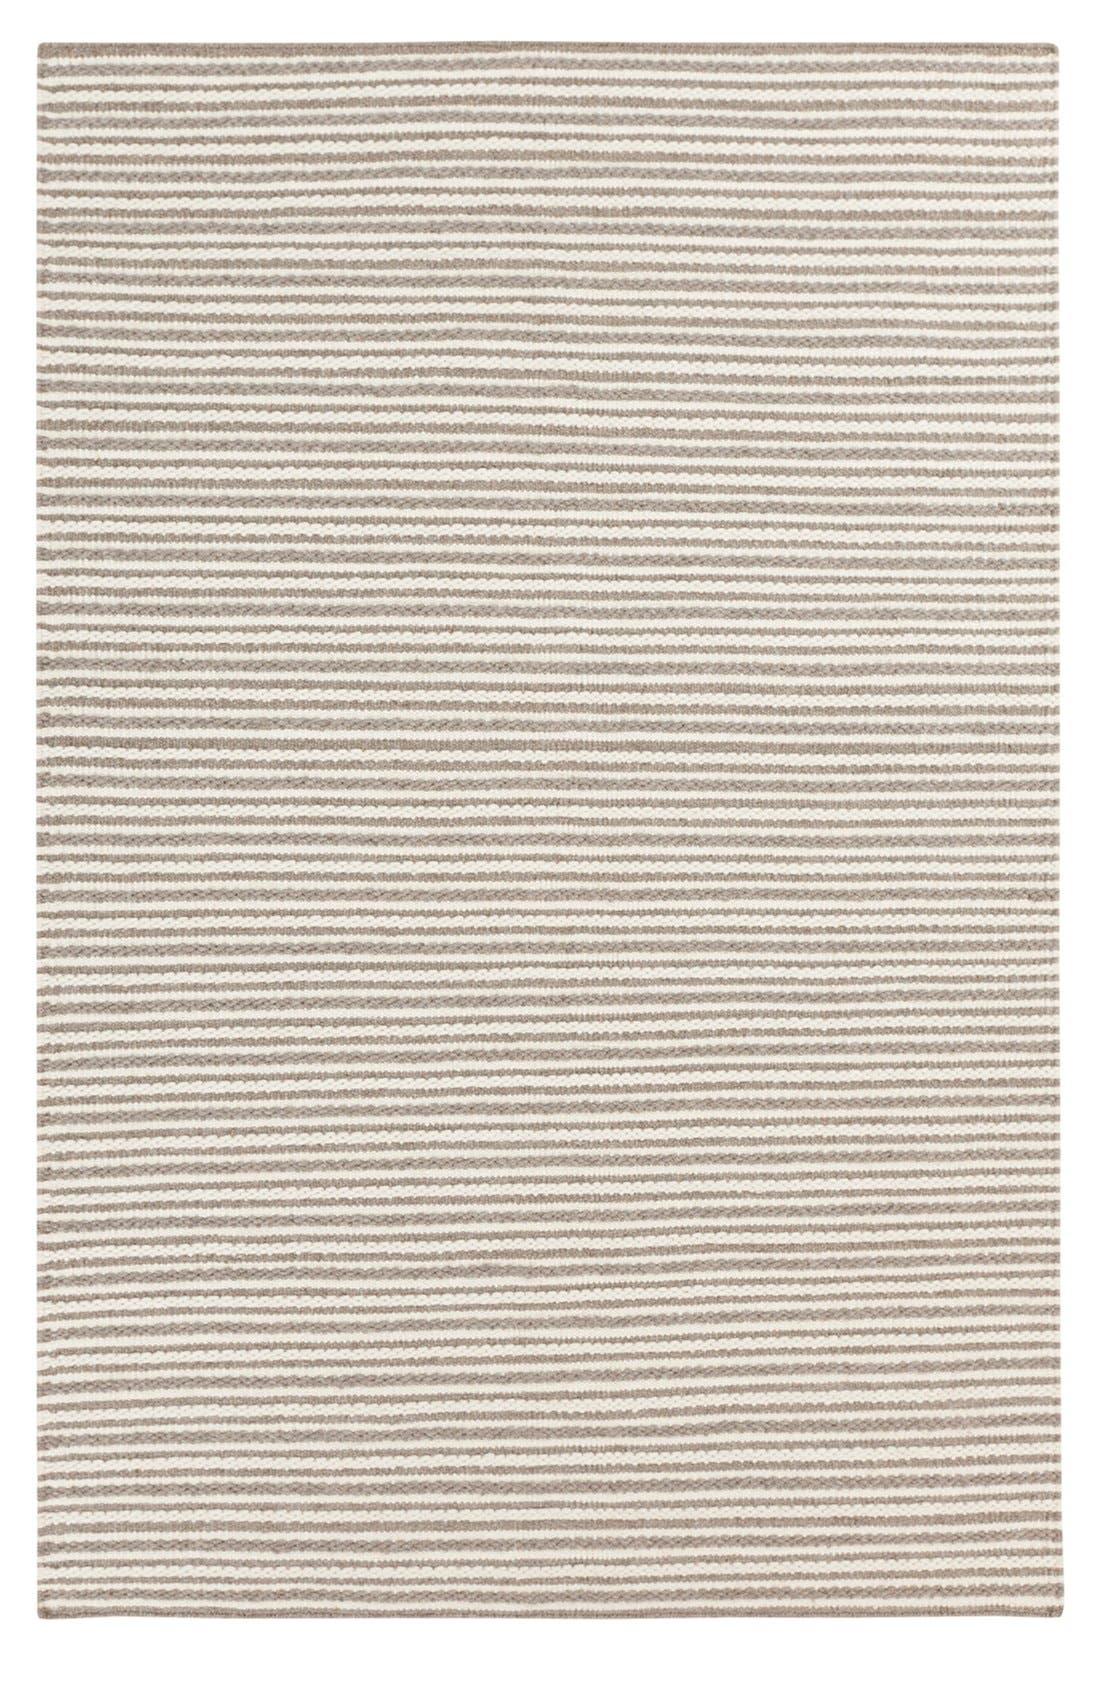 'Ravena' Wool Rug,                             Main thumbnail 1, color,                             Ivory/ Taupe